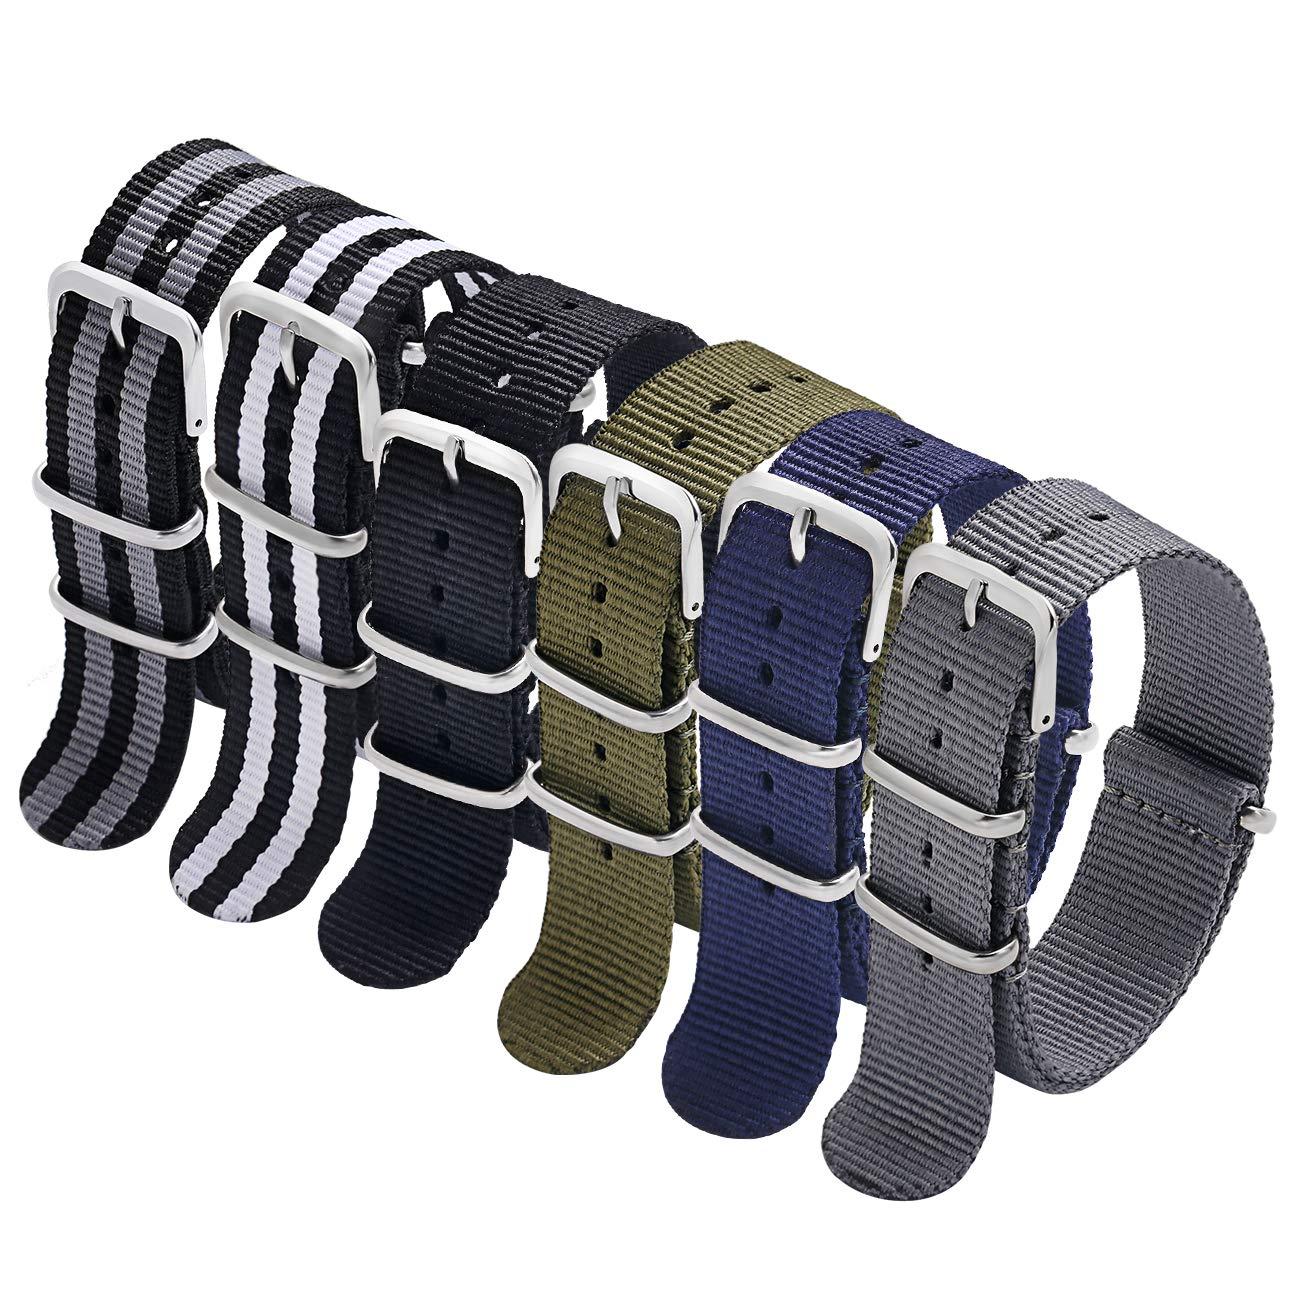 Carty Watch Straps Men Nylon NATO Strap 6 Packs 20mm Watch Band(Black Grey James Bond Stripes+ Black White Stripe+Black+Army Green+Navy Blue+Grey) by Carty